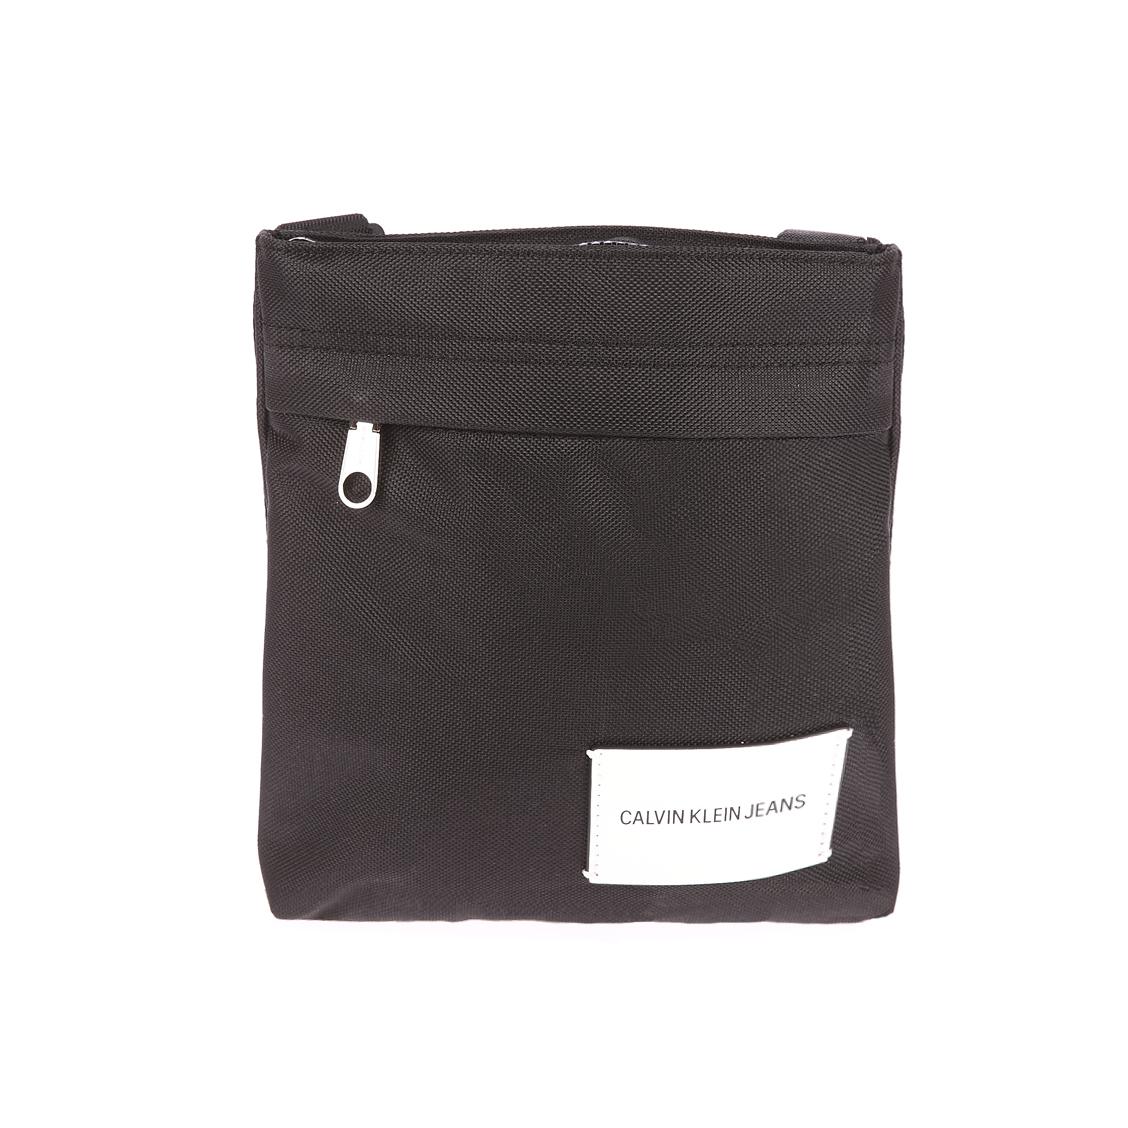 Sacoche plate Calvin Klein Sport Essential Micr en toile noire. Sacoche plate Calvin Klein Sport Essential Micr en toile noire